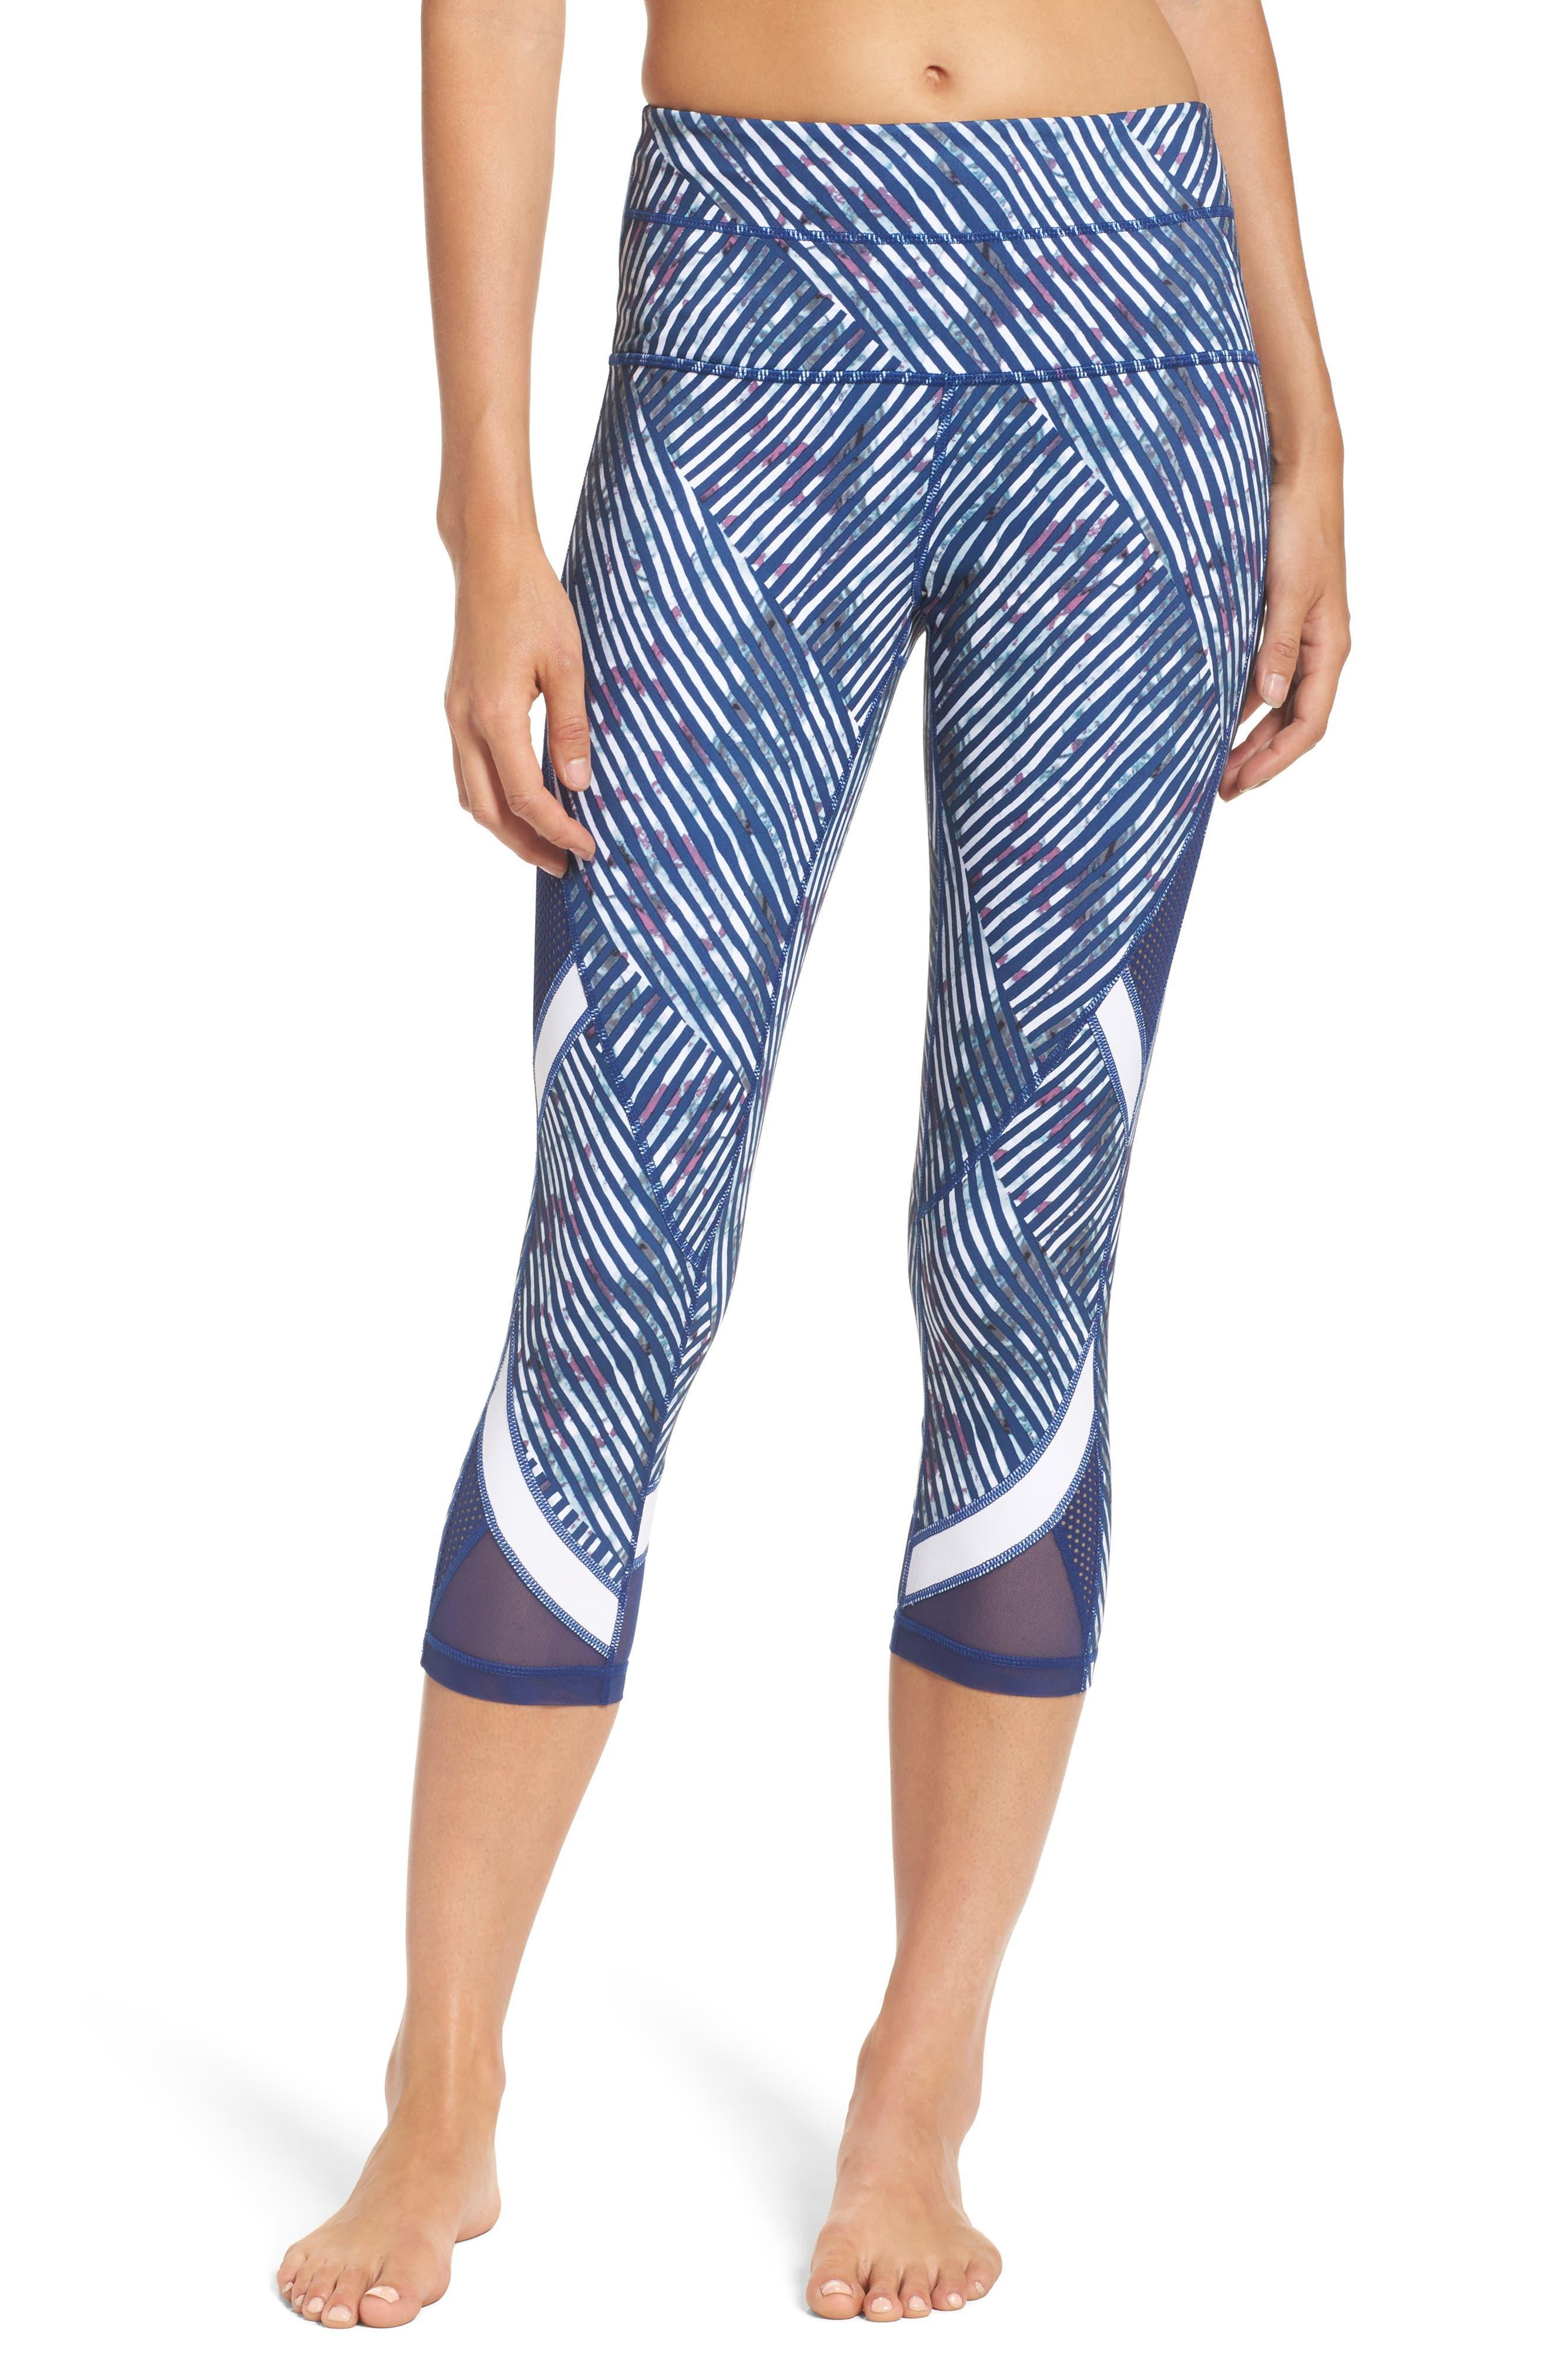 Mesh-Up High Waist Crop Leggings,                         Main,                         color, Blue Depths Diagonal Print